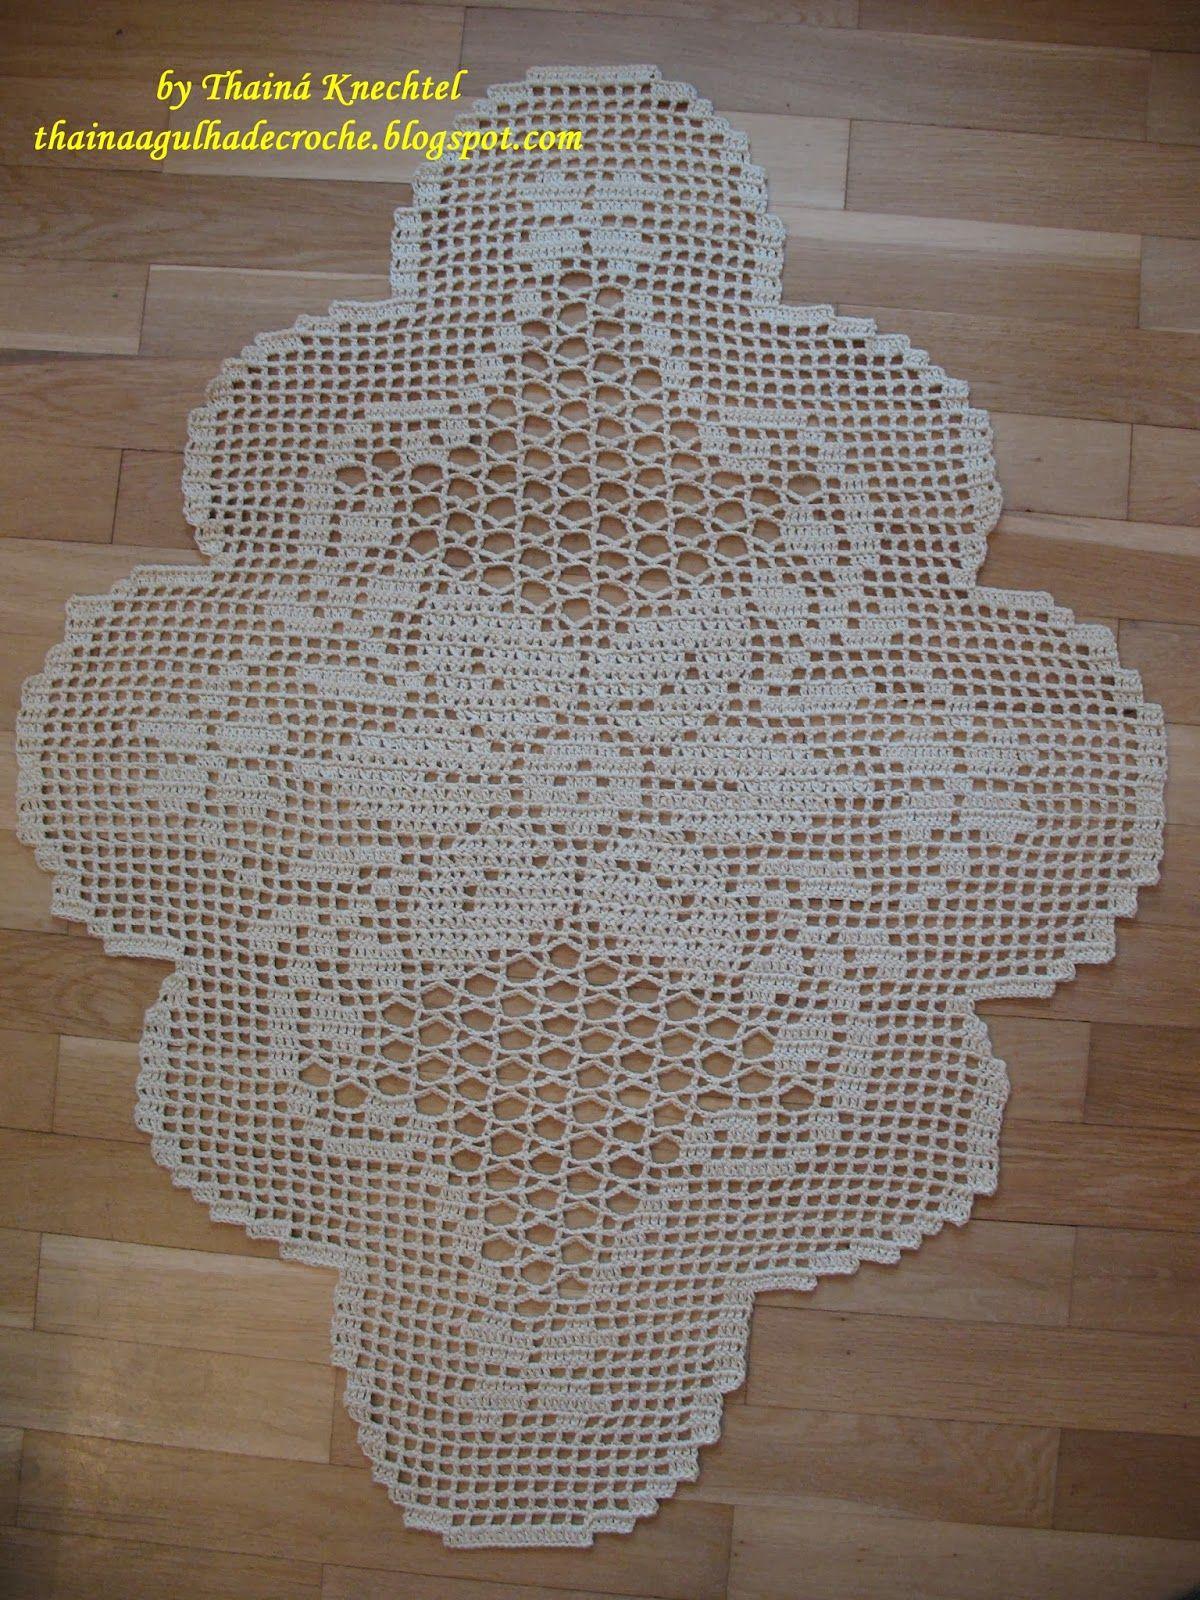 Thainá Agulha de Crochê: Caminho de mesa em crochê / Gehäkelter ...